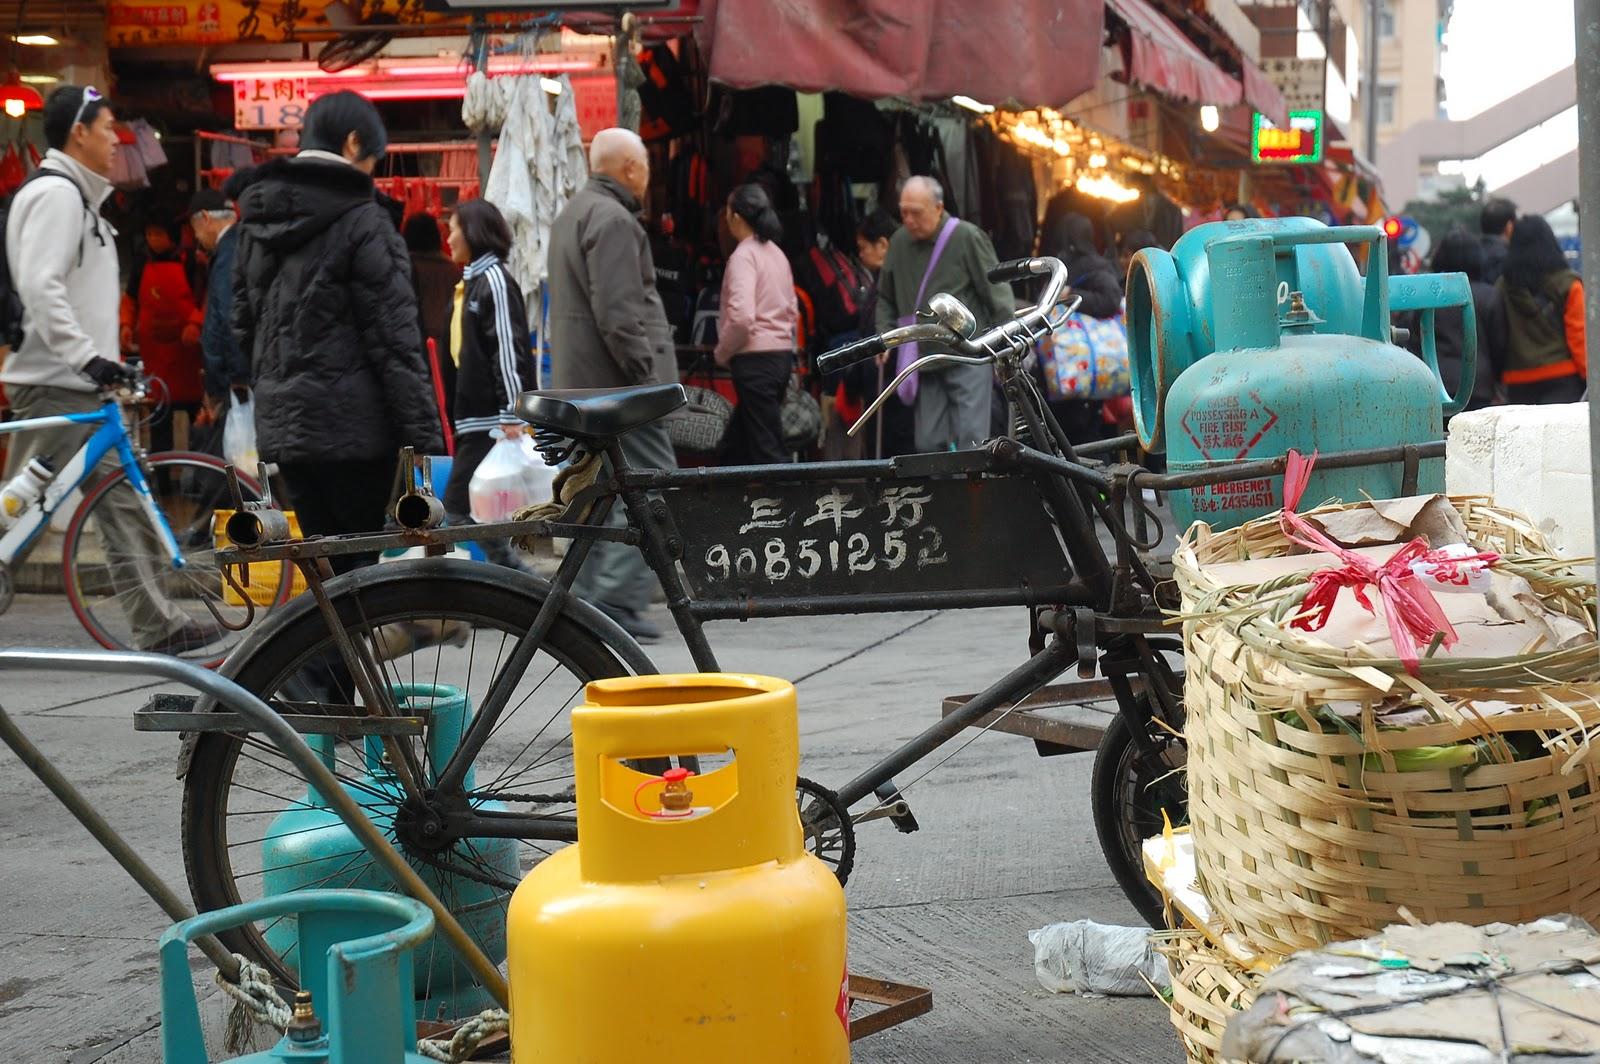 cargo bikes have 3-wheel.